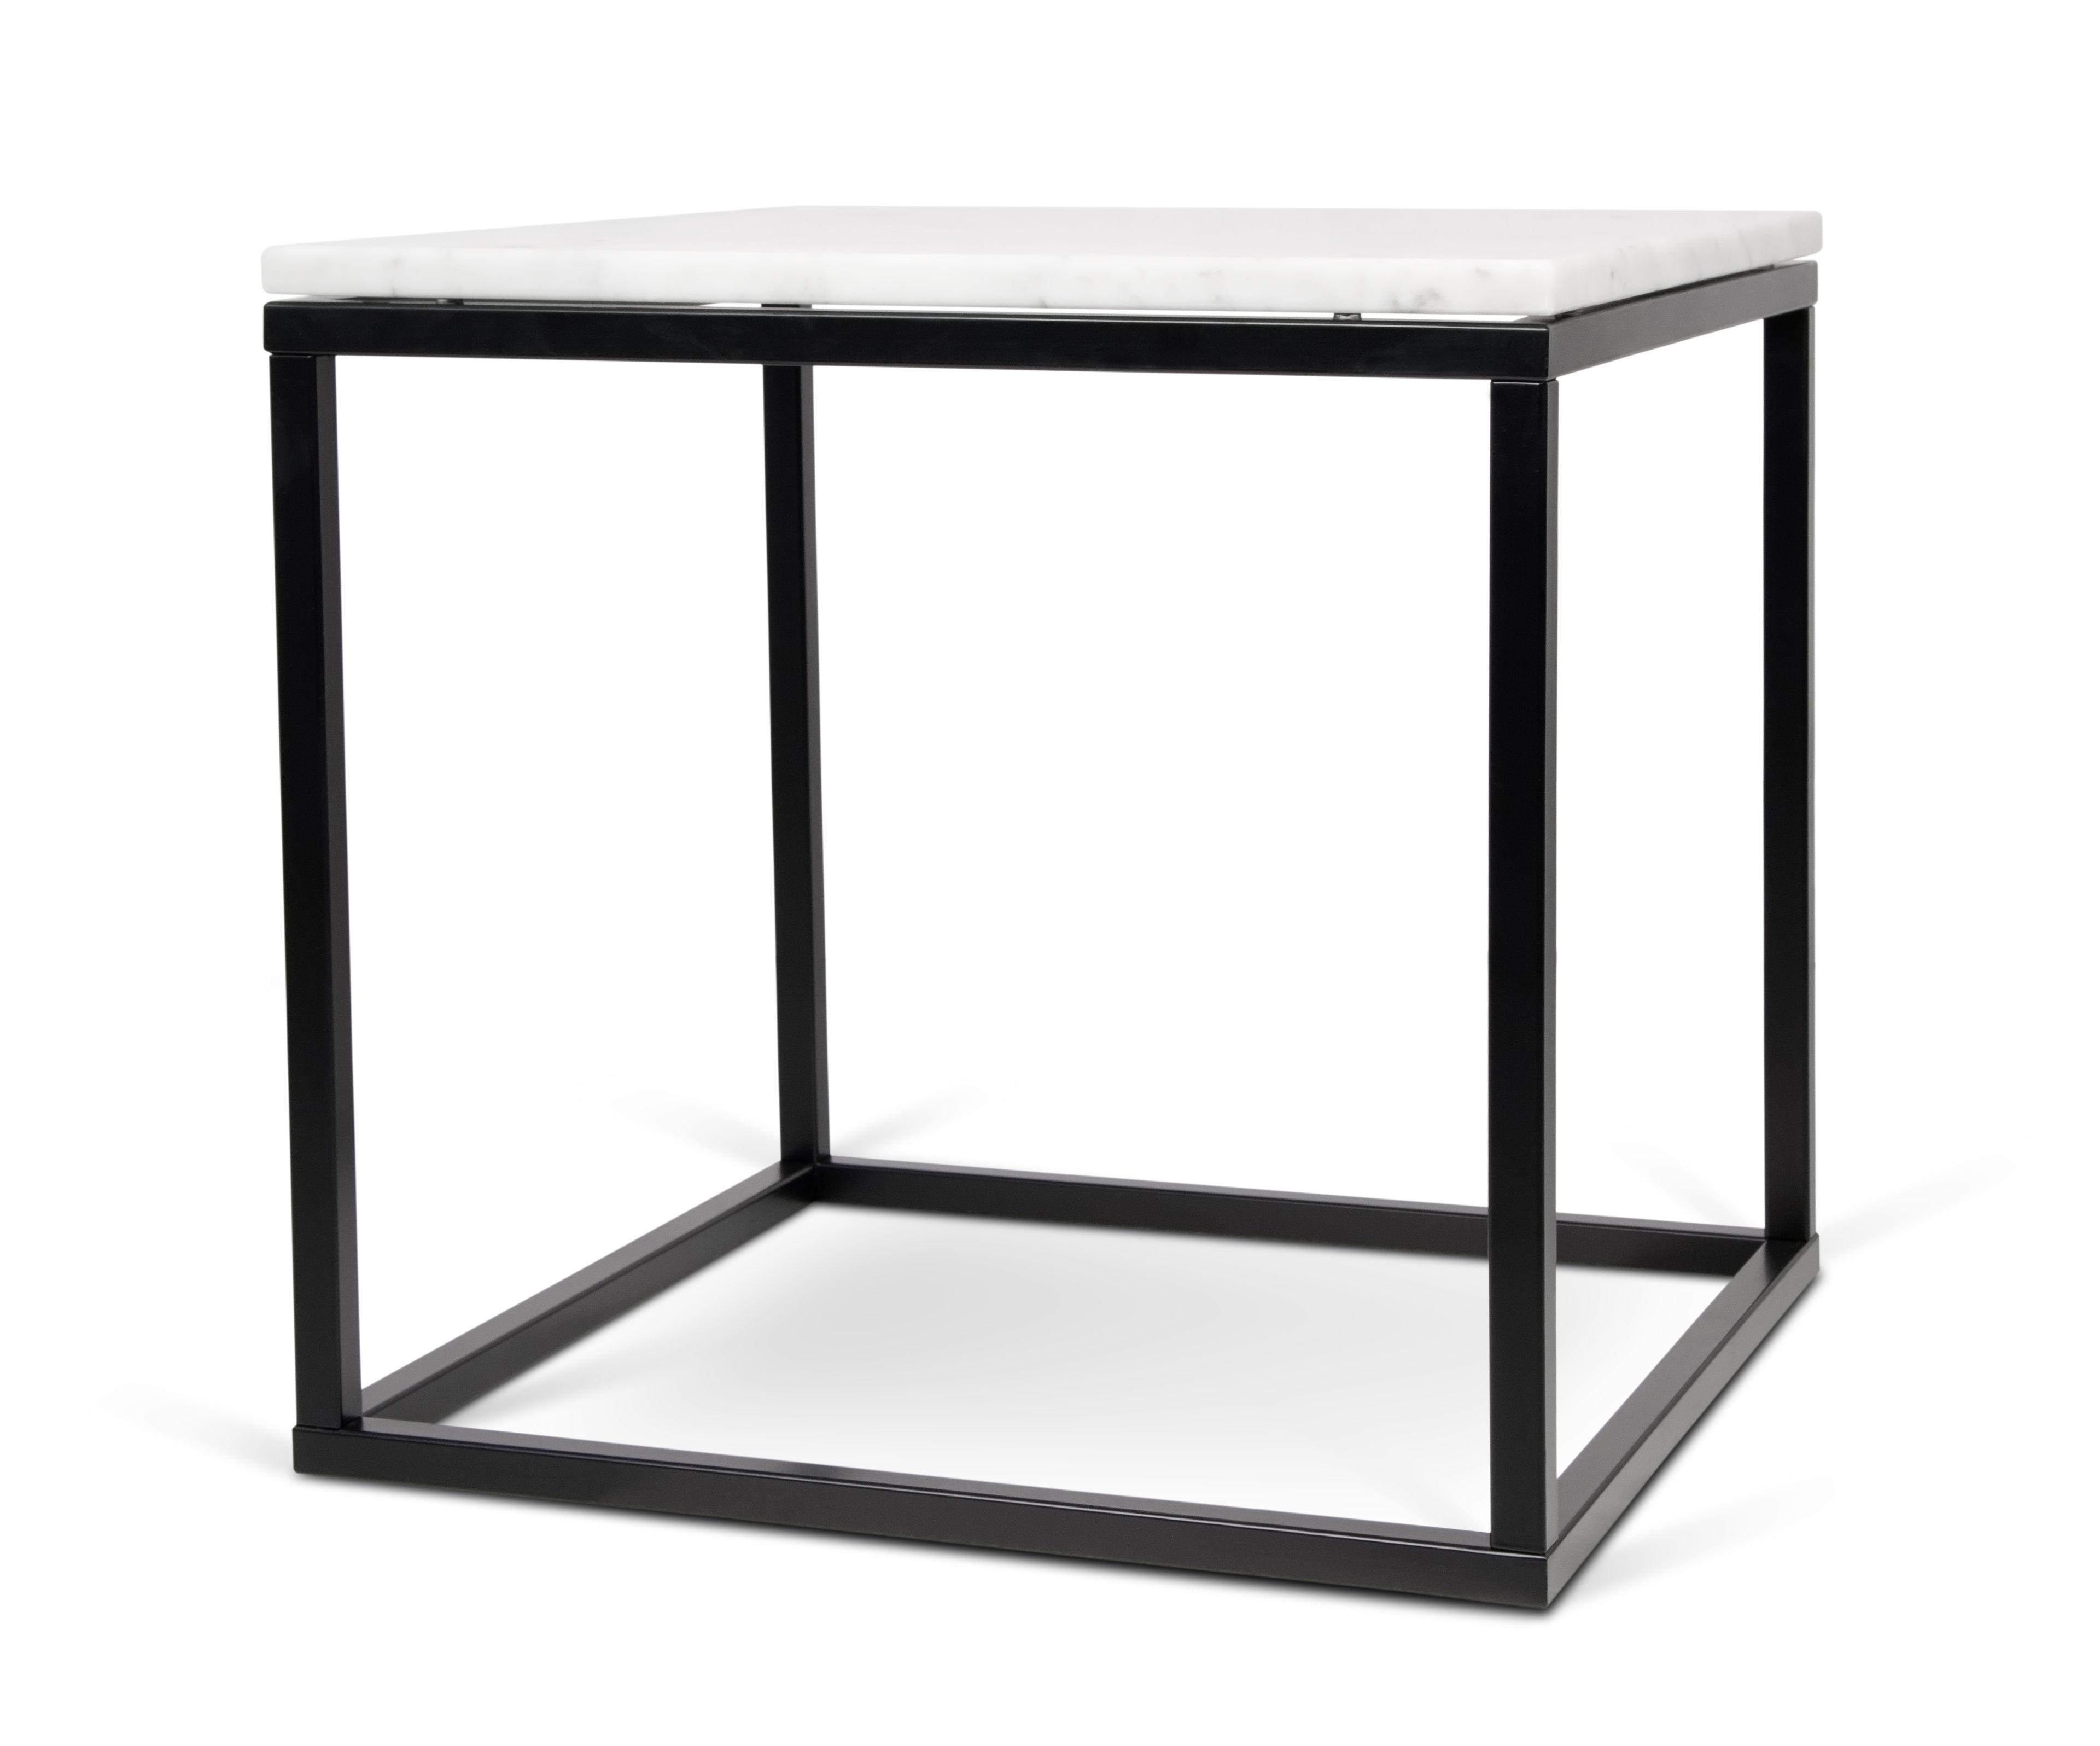 table basse marble marbre 50 x 50cm marbre blanc pied noir pop up home made in design. Black Bedroom Furniture Sets. Home Design Ideas